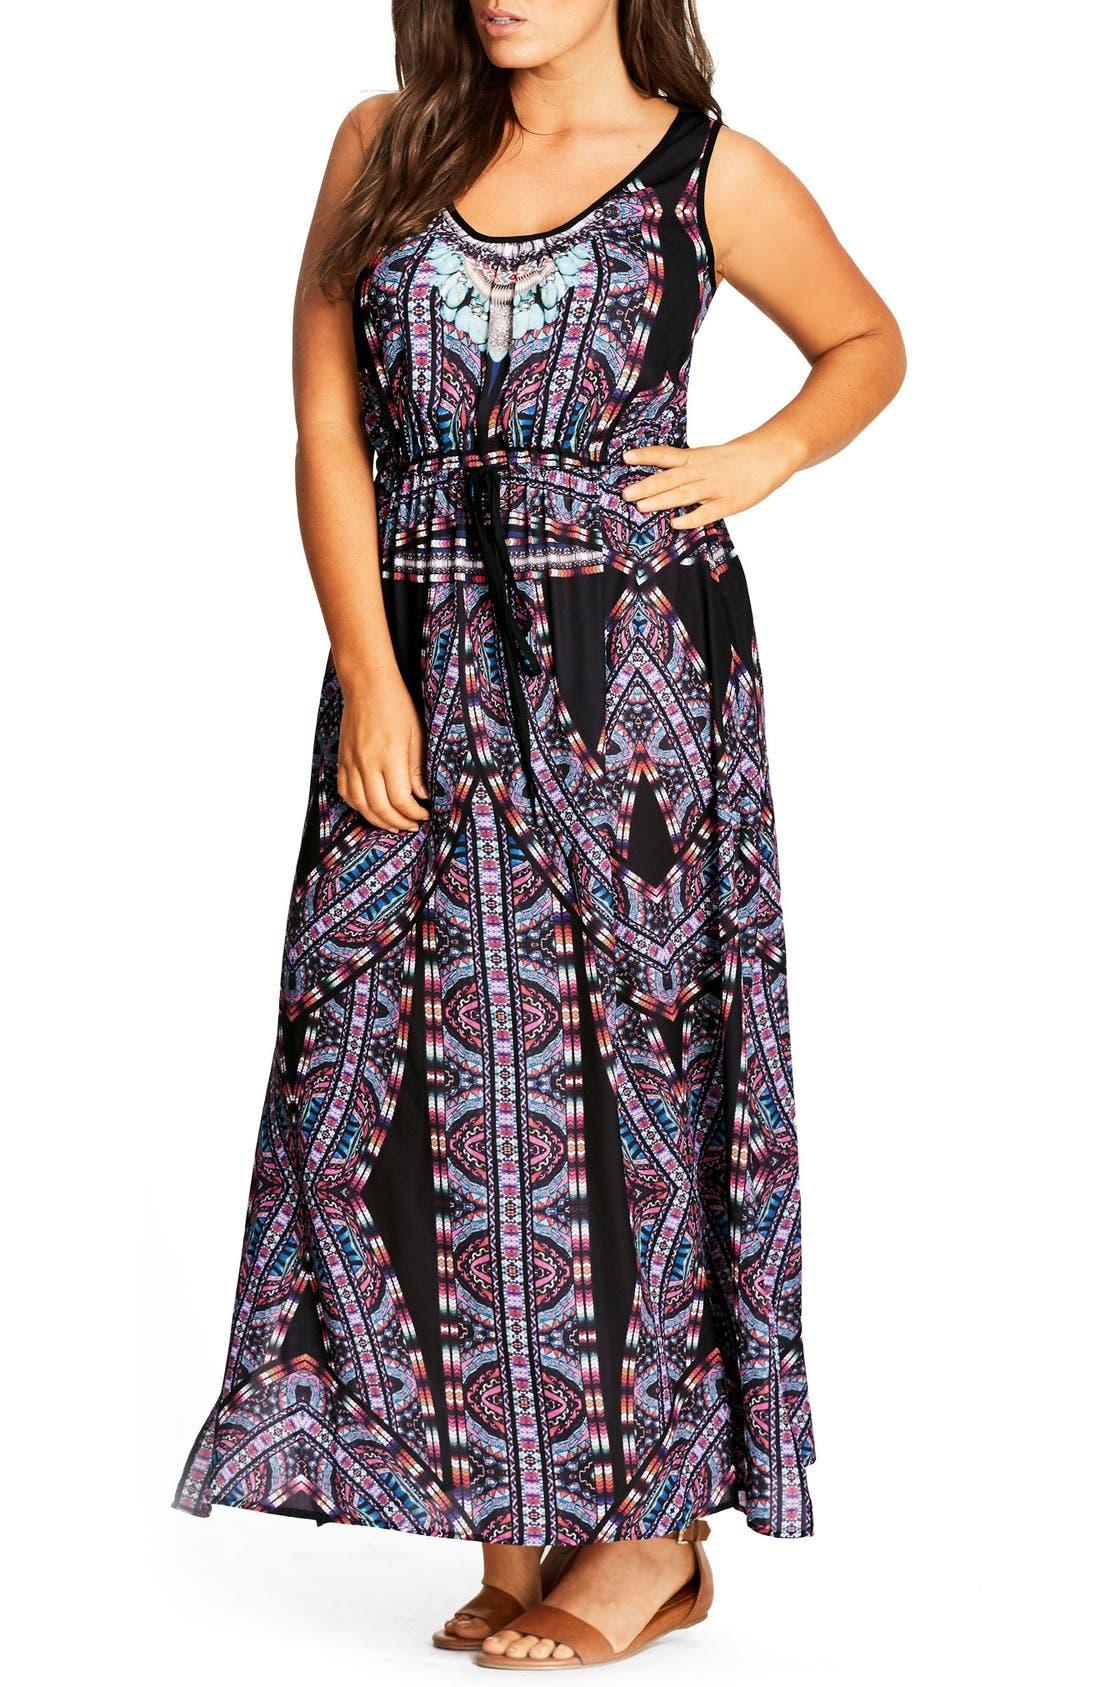 Alternate Image 1 Selected - City Chic 'Biba' Drawstring Maxi Dress (Plus Size)